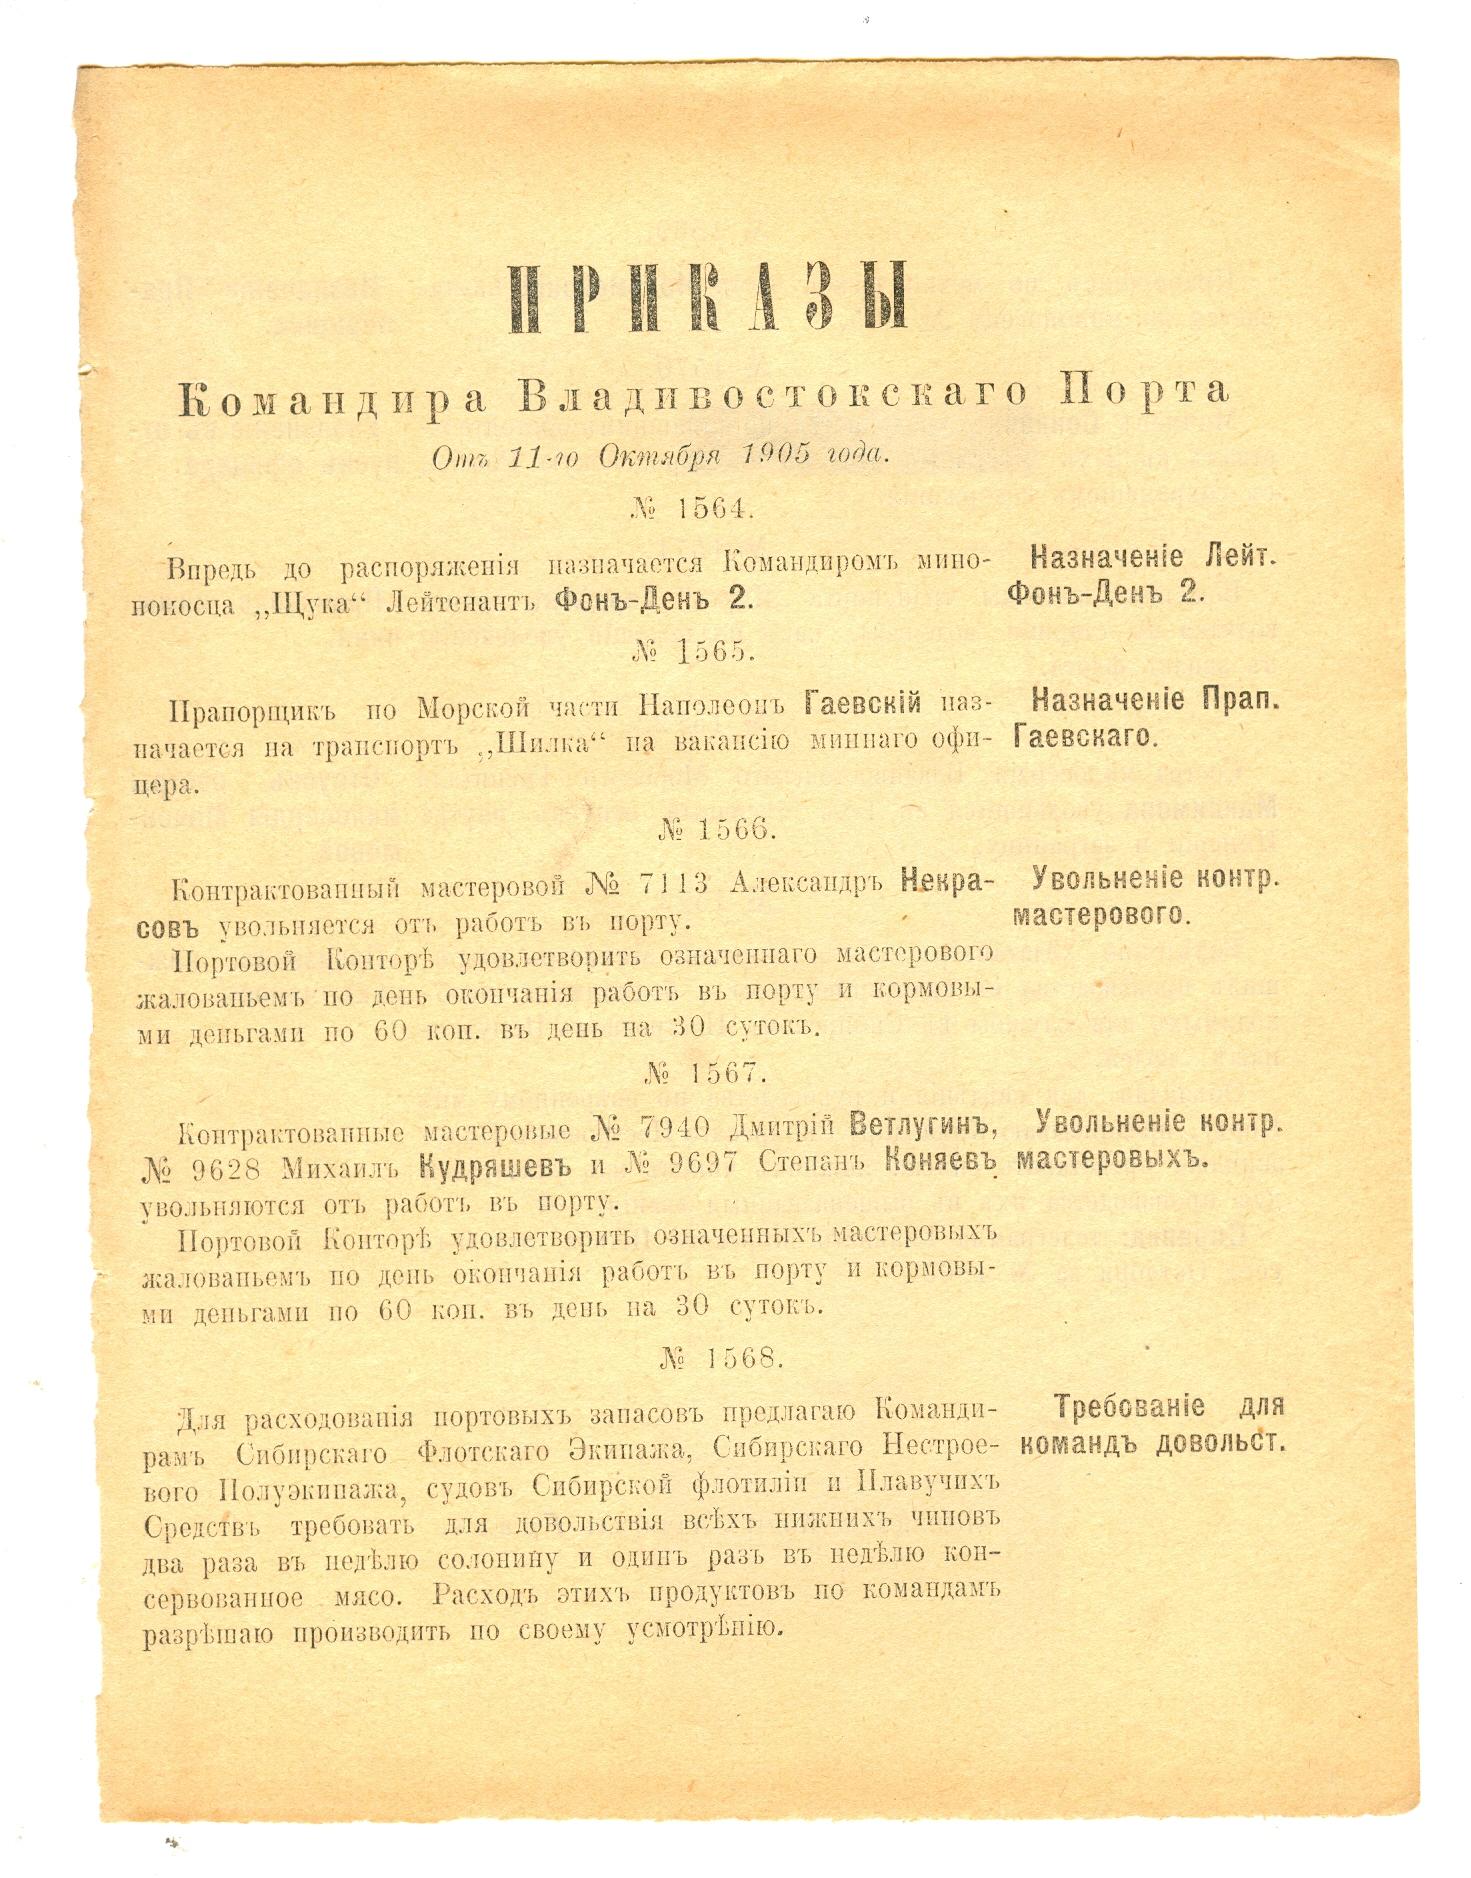 От 11-го Октября 1905 года.